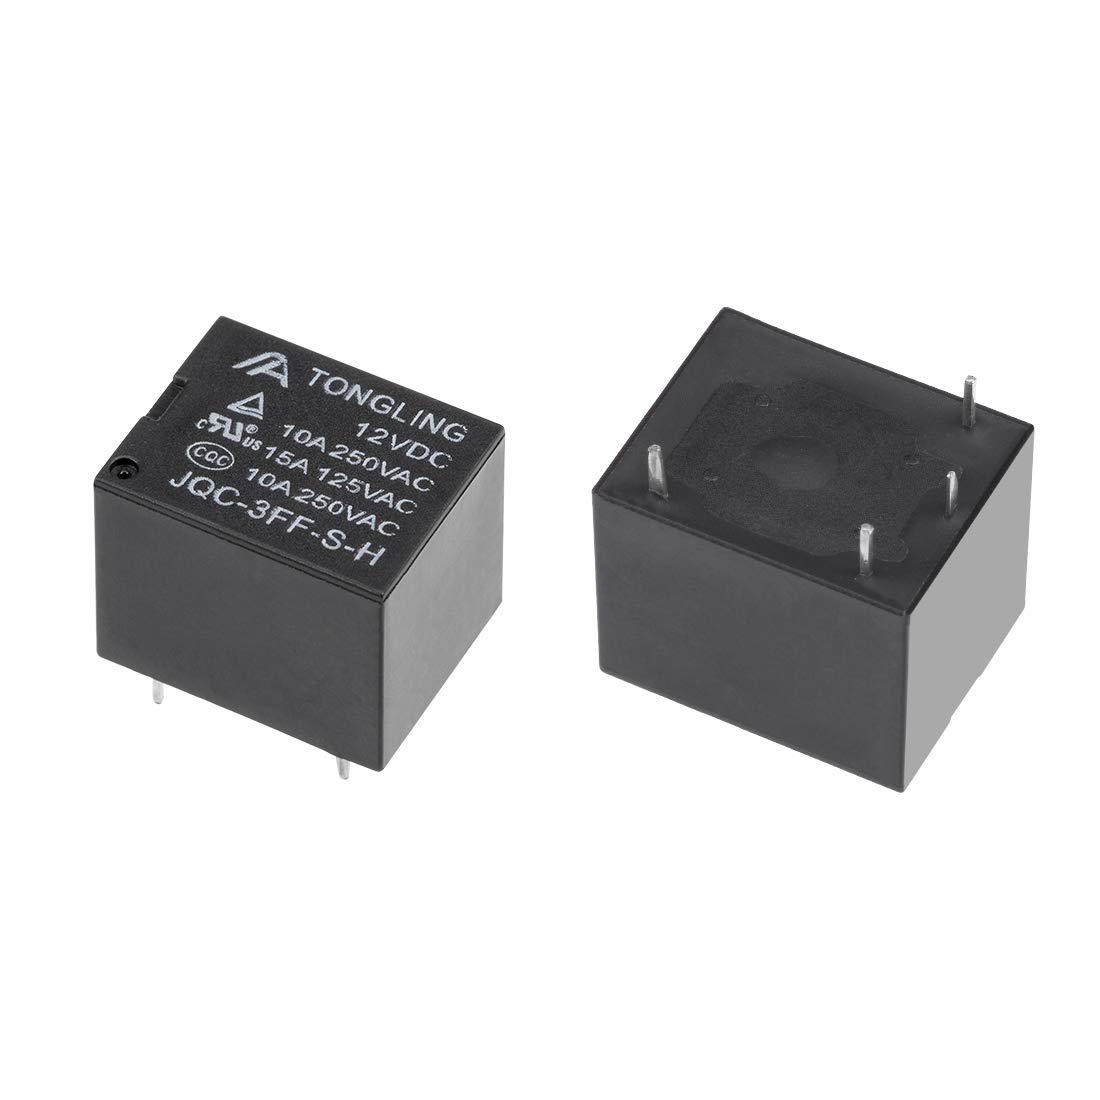 uxcell 5 Pcs JQC-T78-DC24V-C DC 24V Coil SPDT 5 Pin PCB Electromagnetic Power Relay